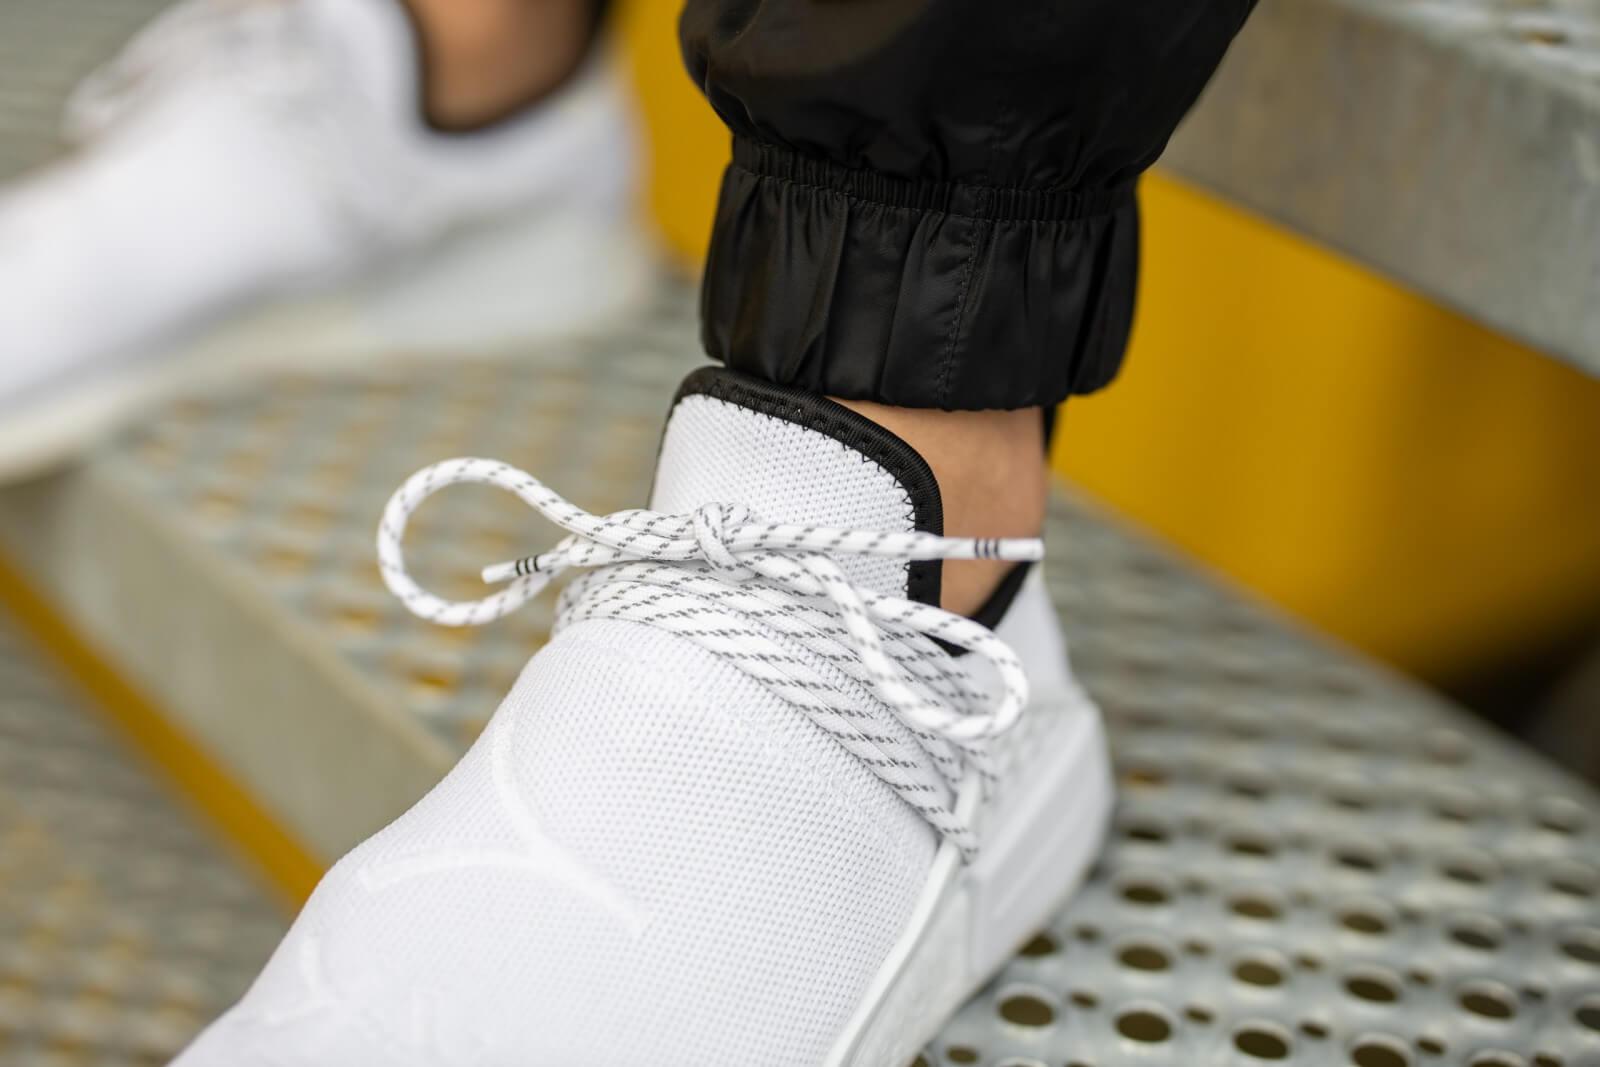 Adidas x Pharrell Williams HU NMD Cloud White/Core Black